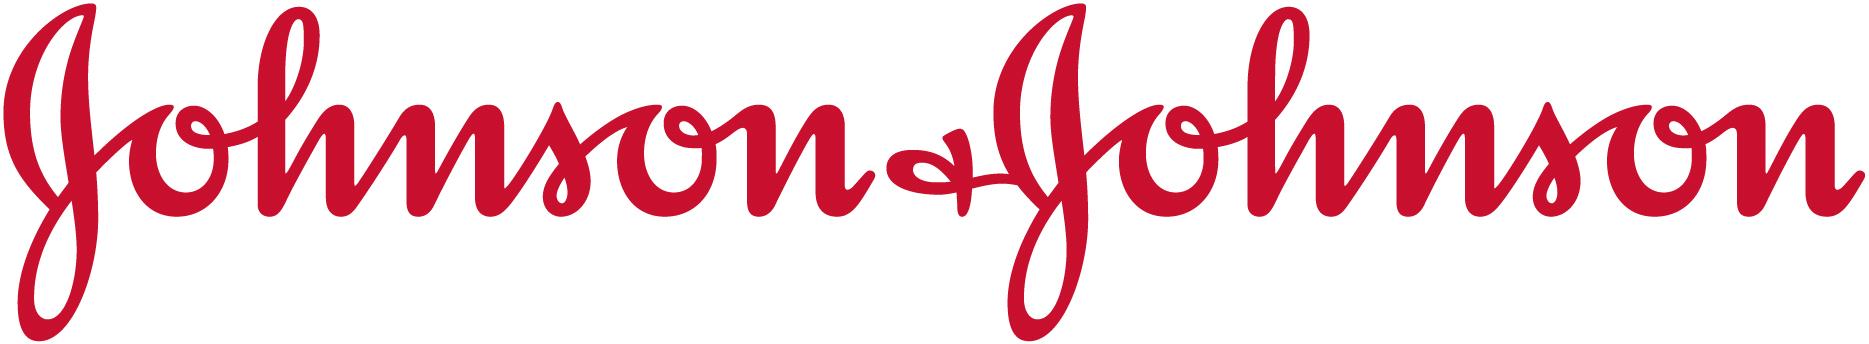 j-j-logosignature